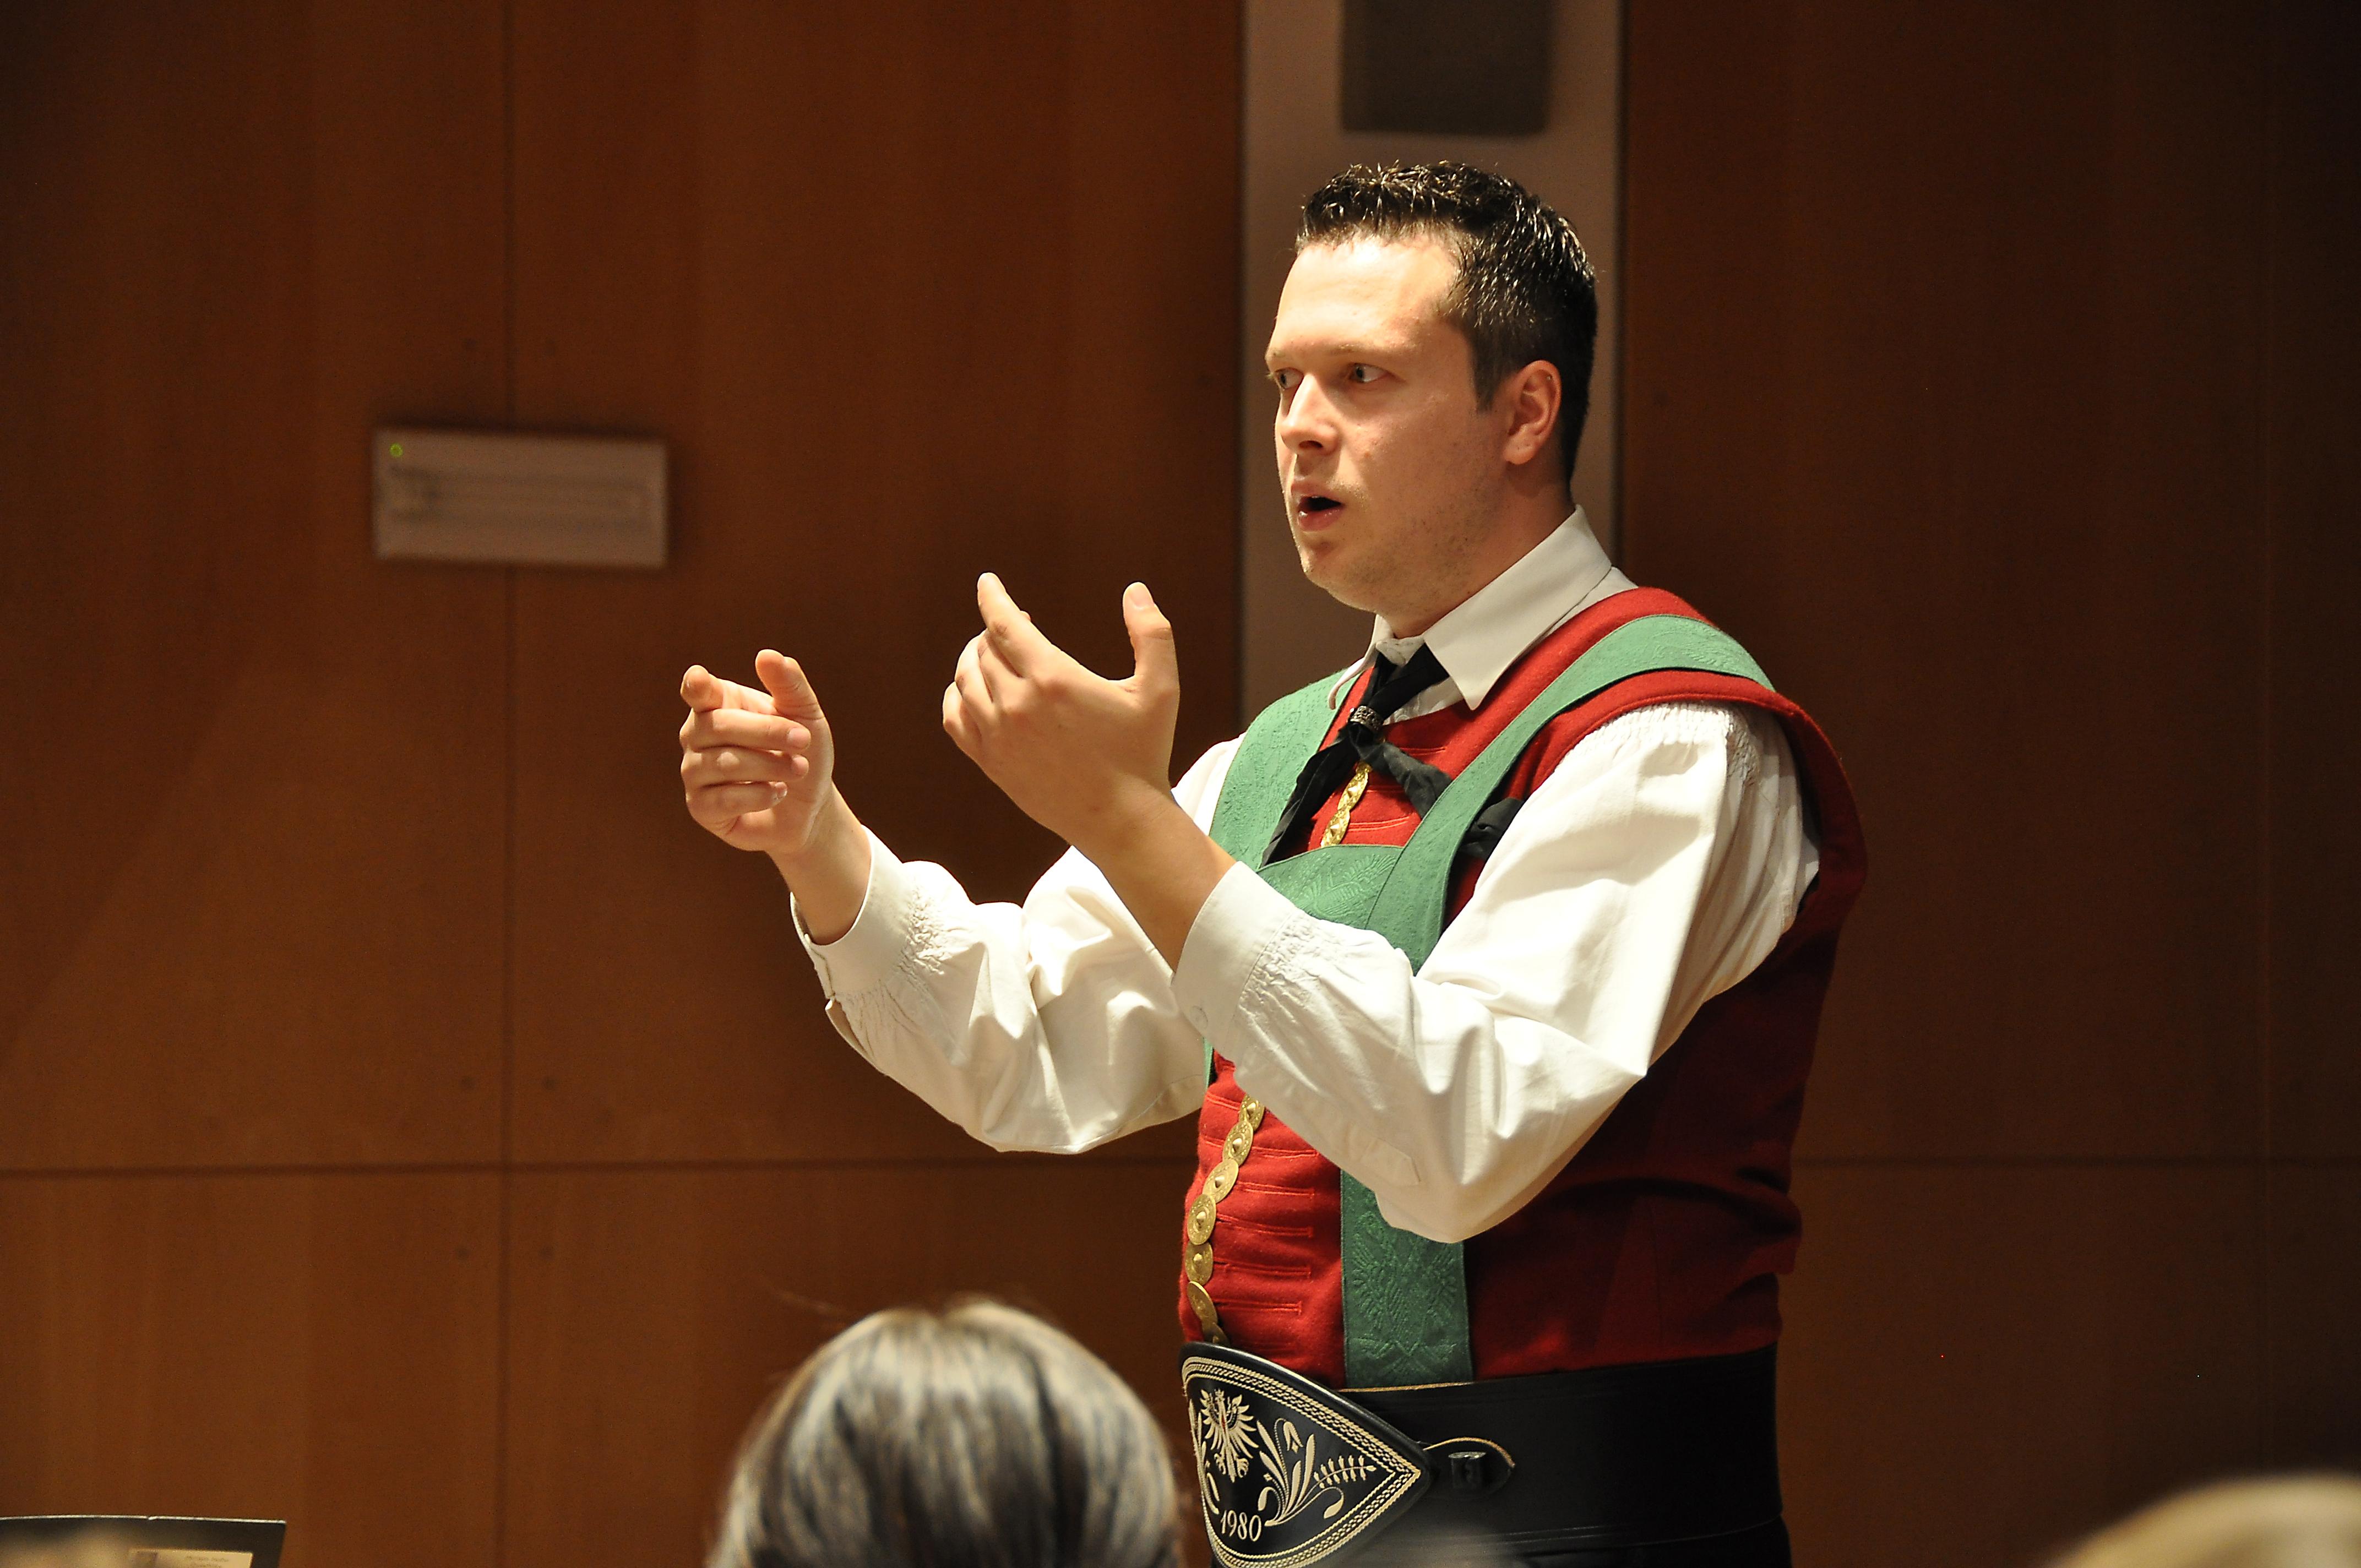 Martin Rainer - Kapellmeister